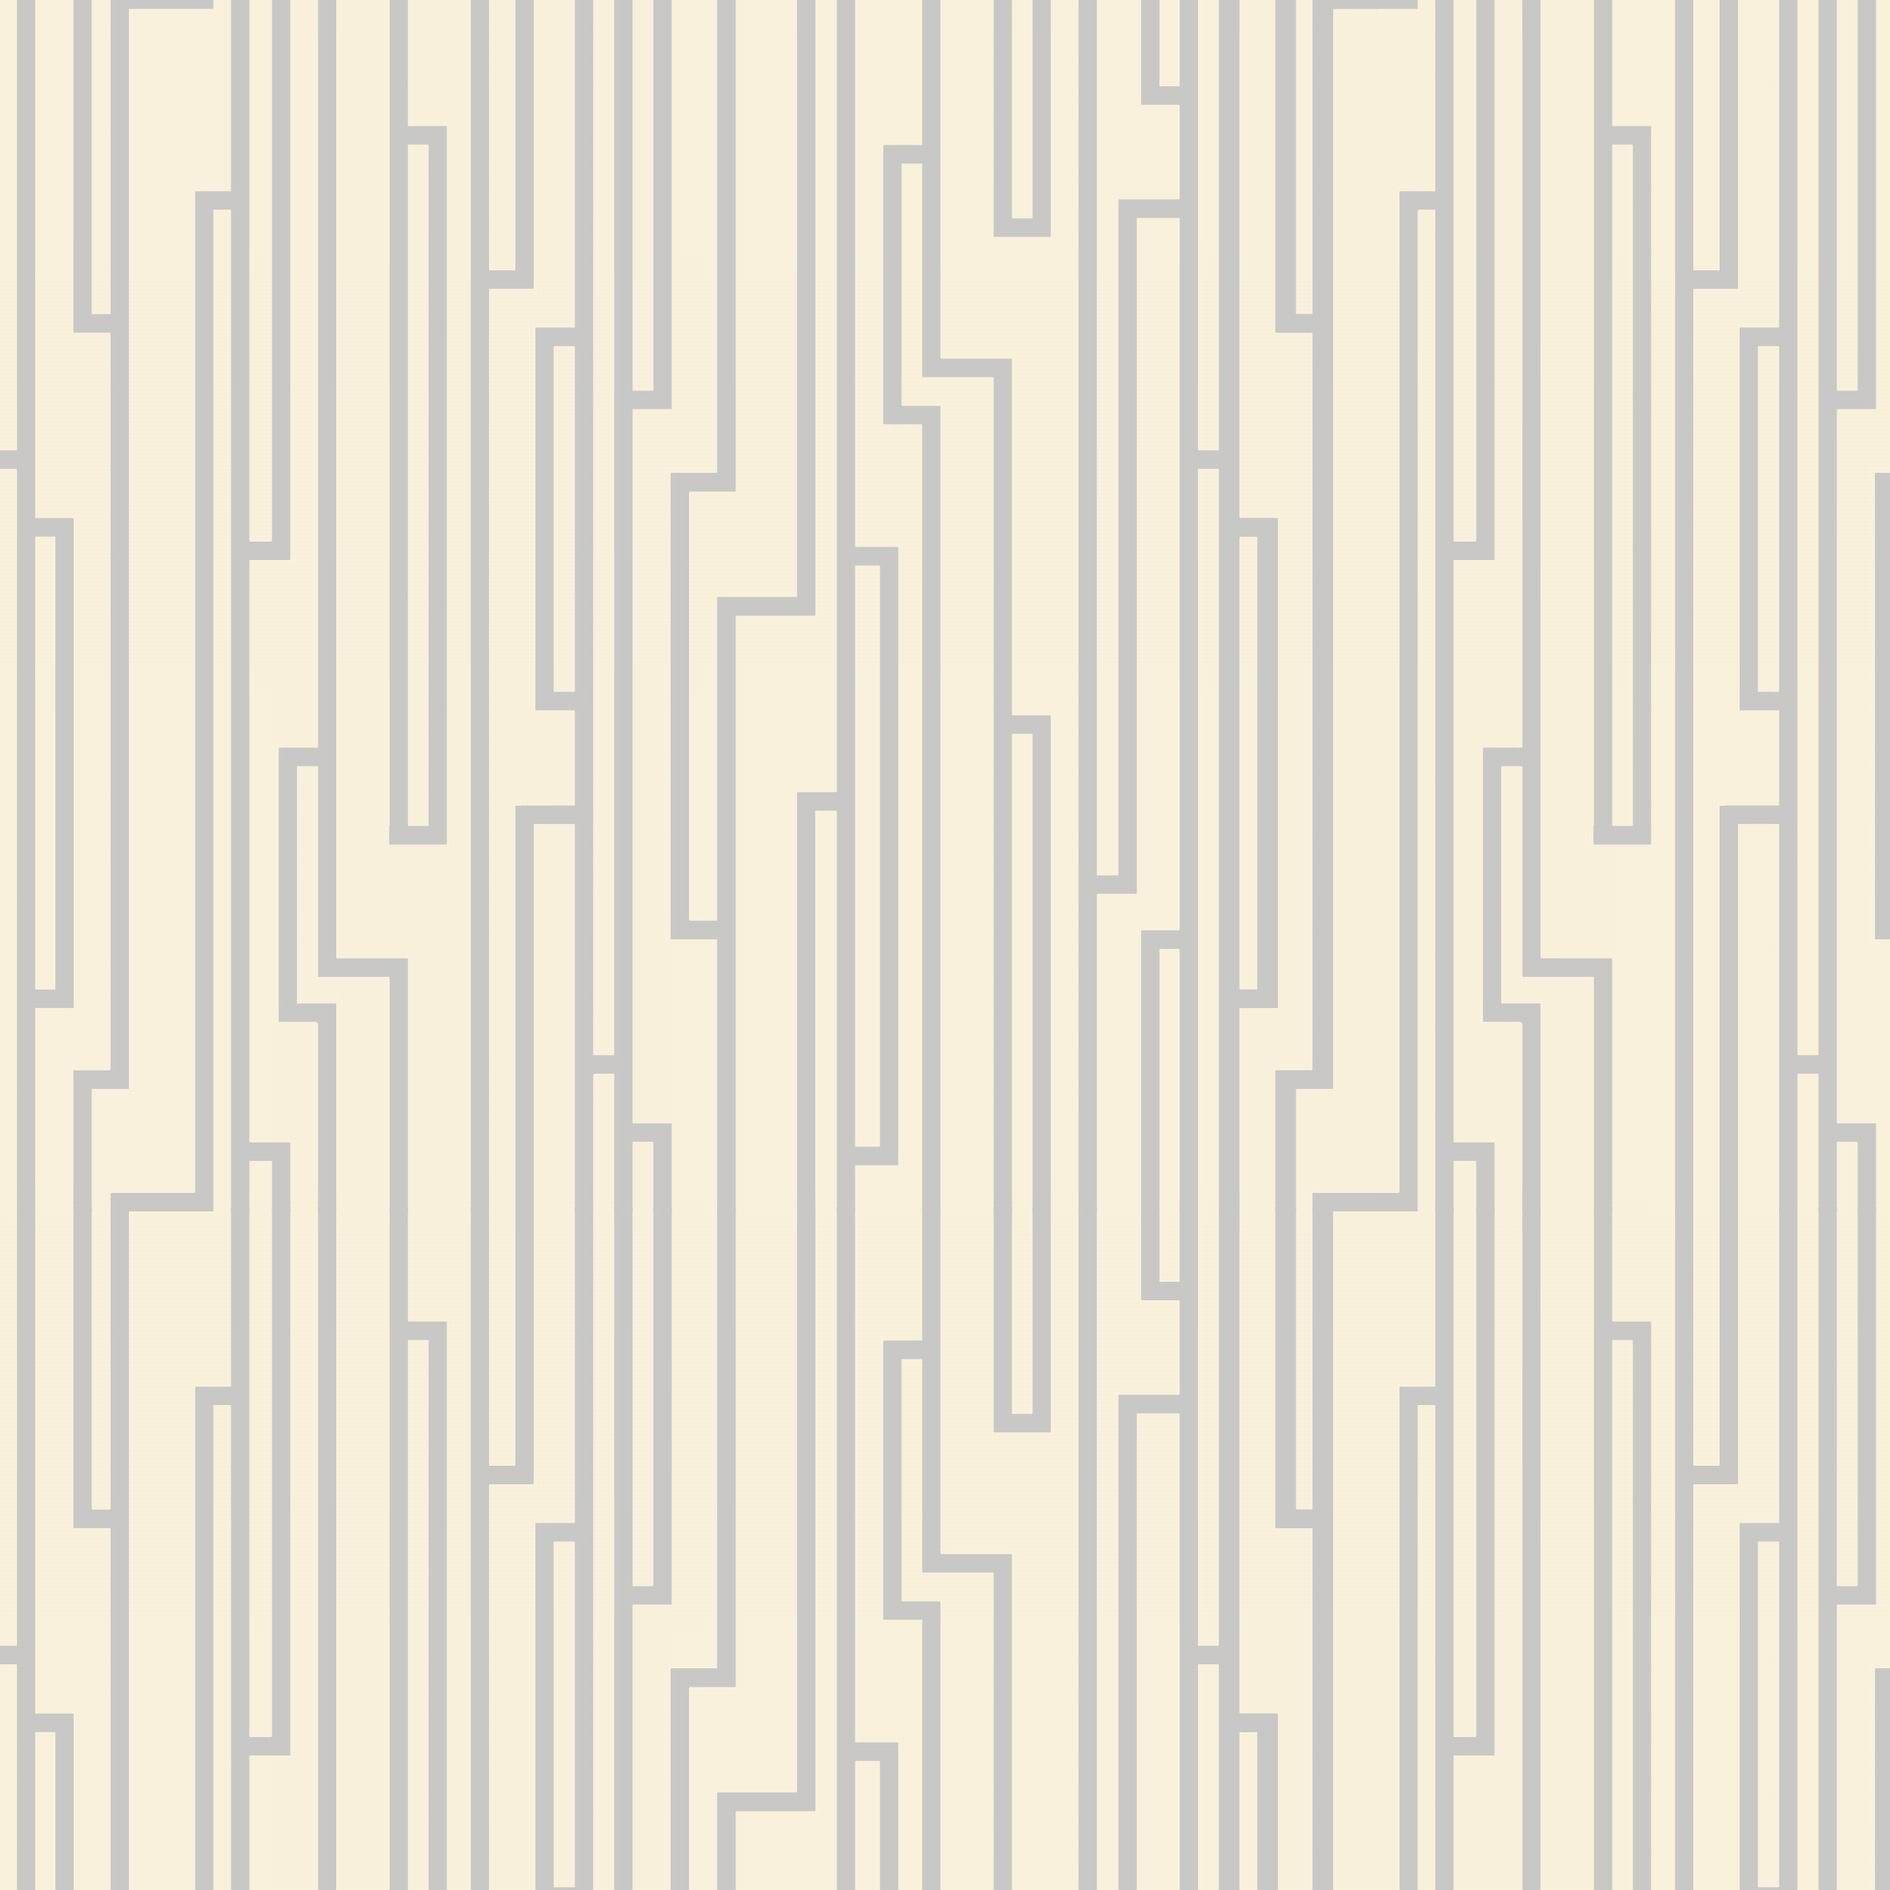 Surrounding Patterns.